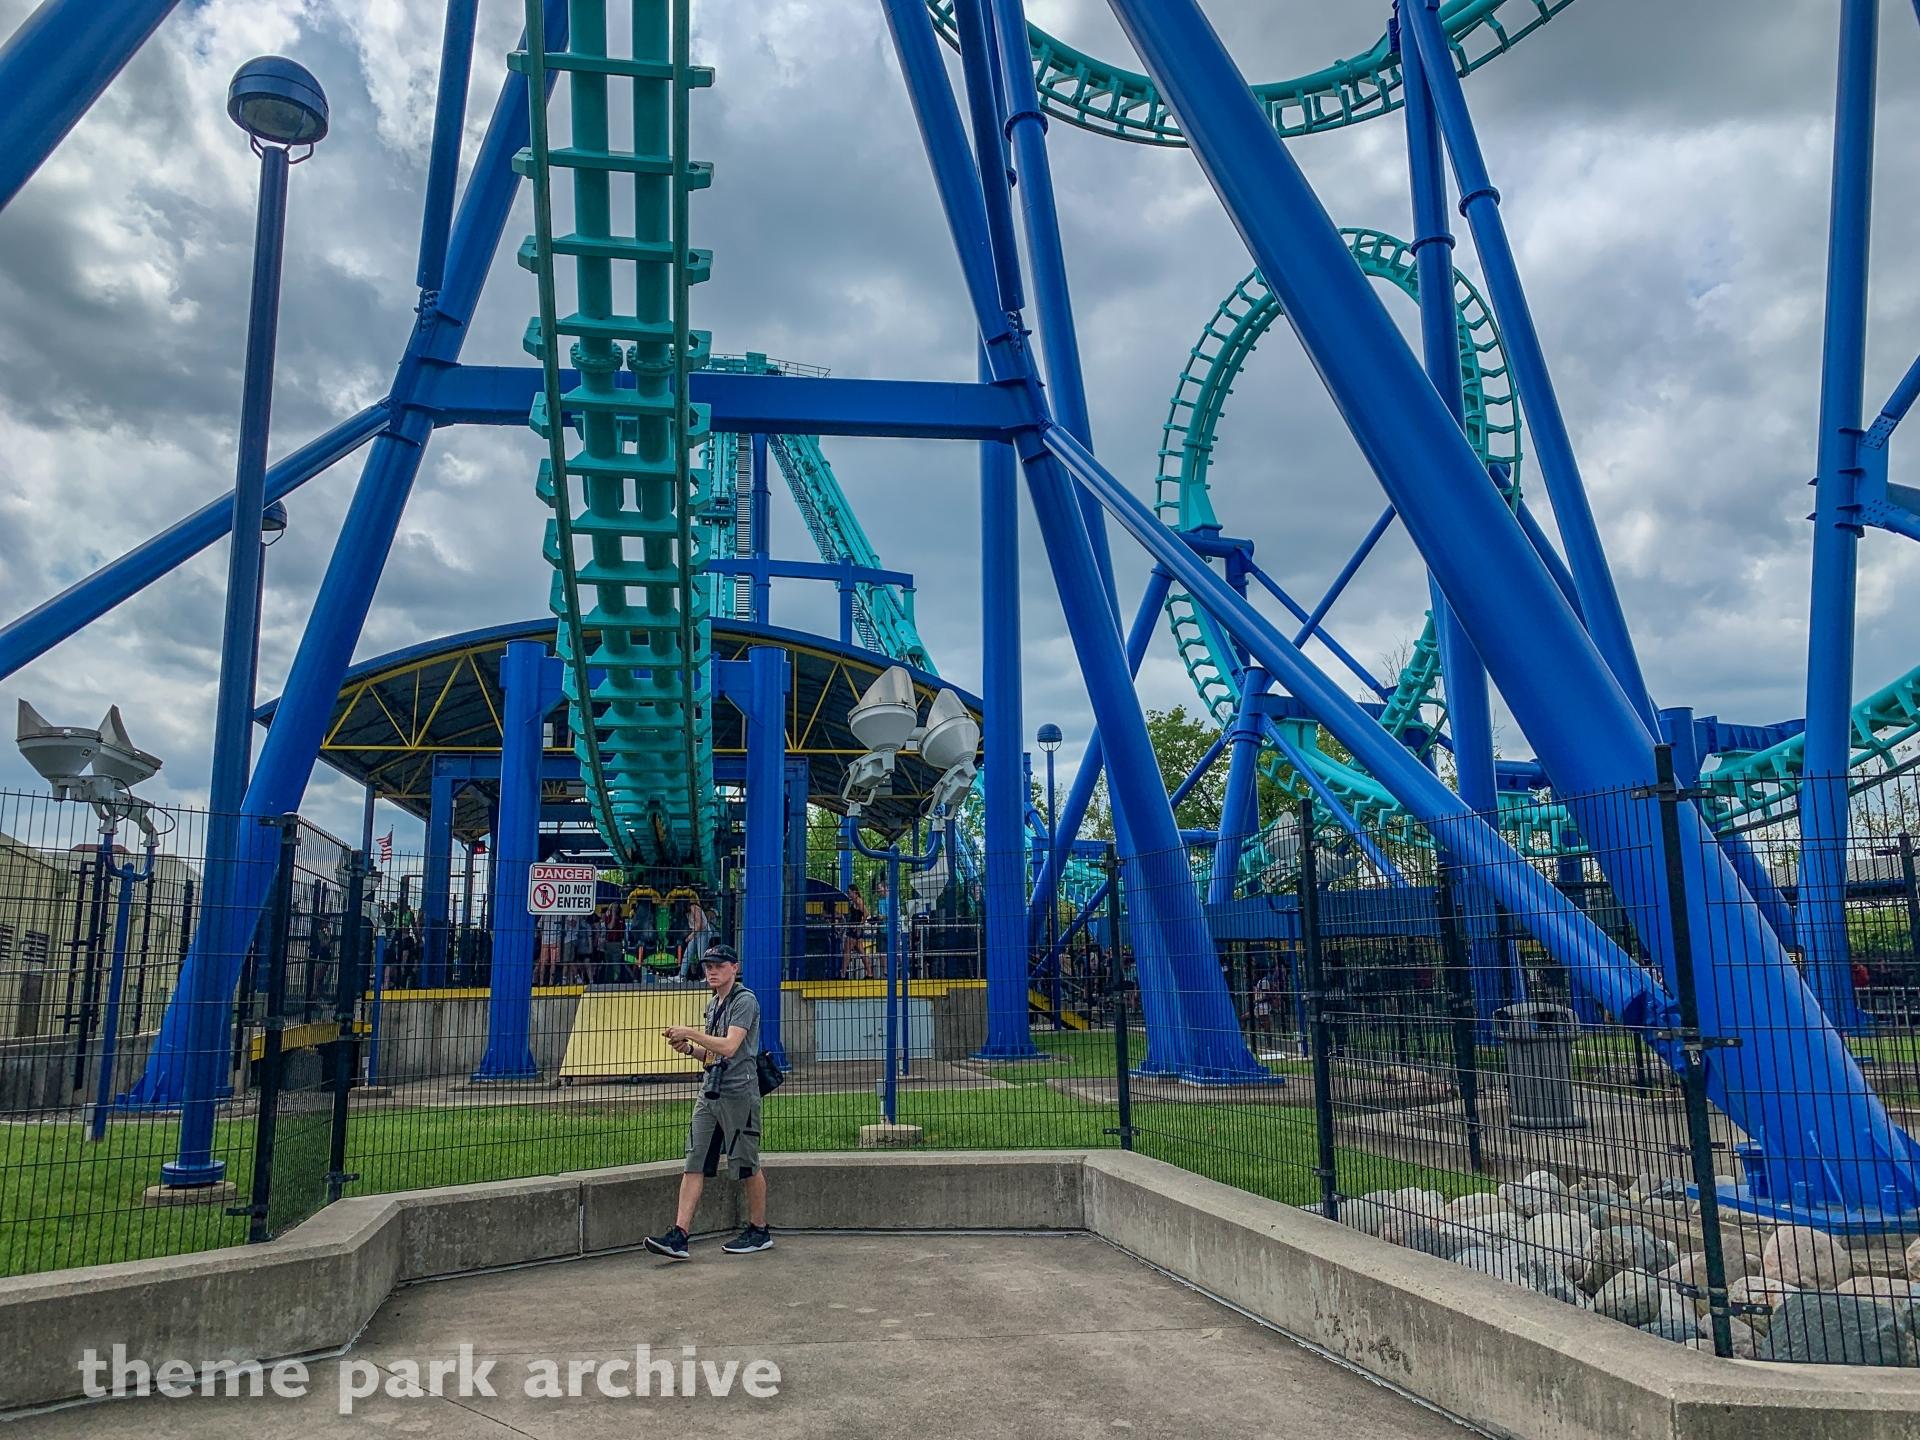 Invertigo at Kings Island | Theme Park Archive